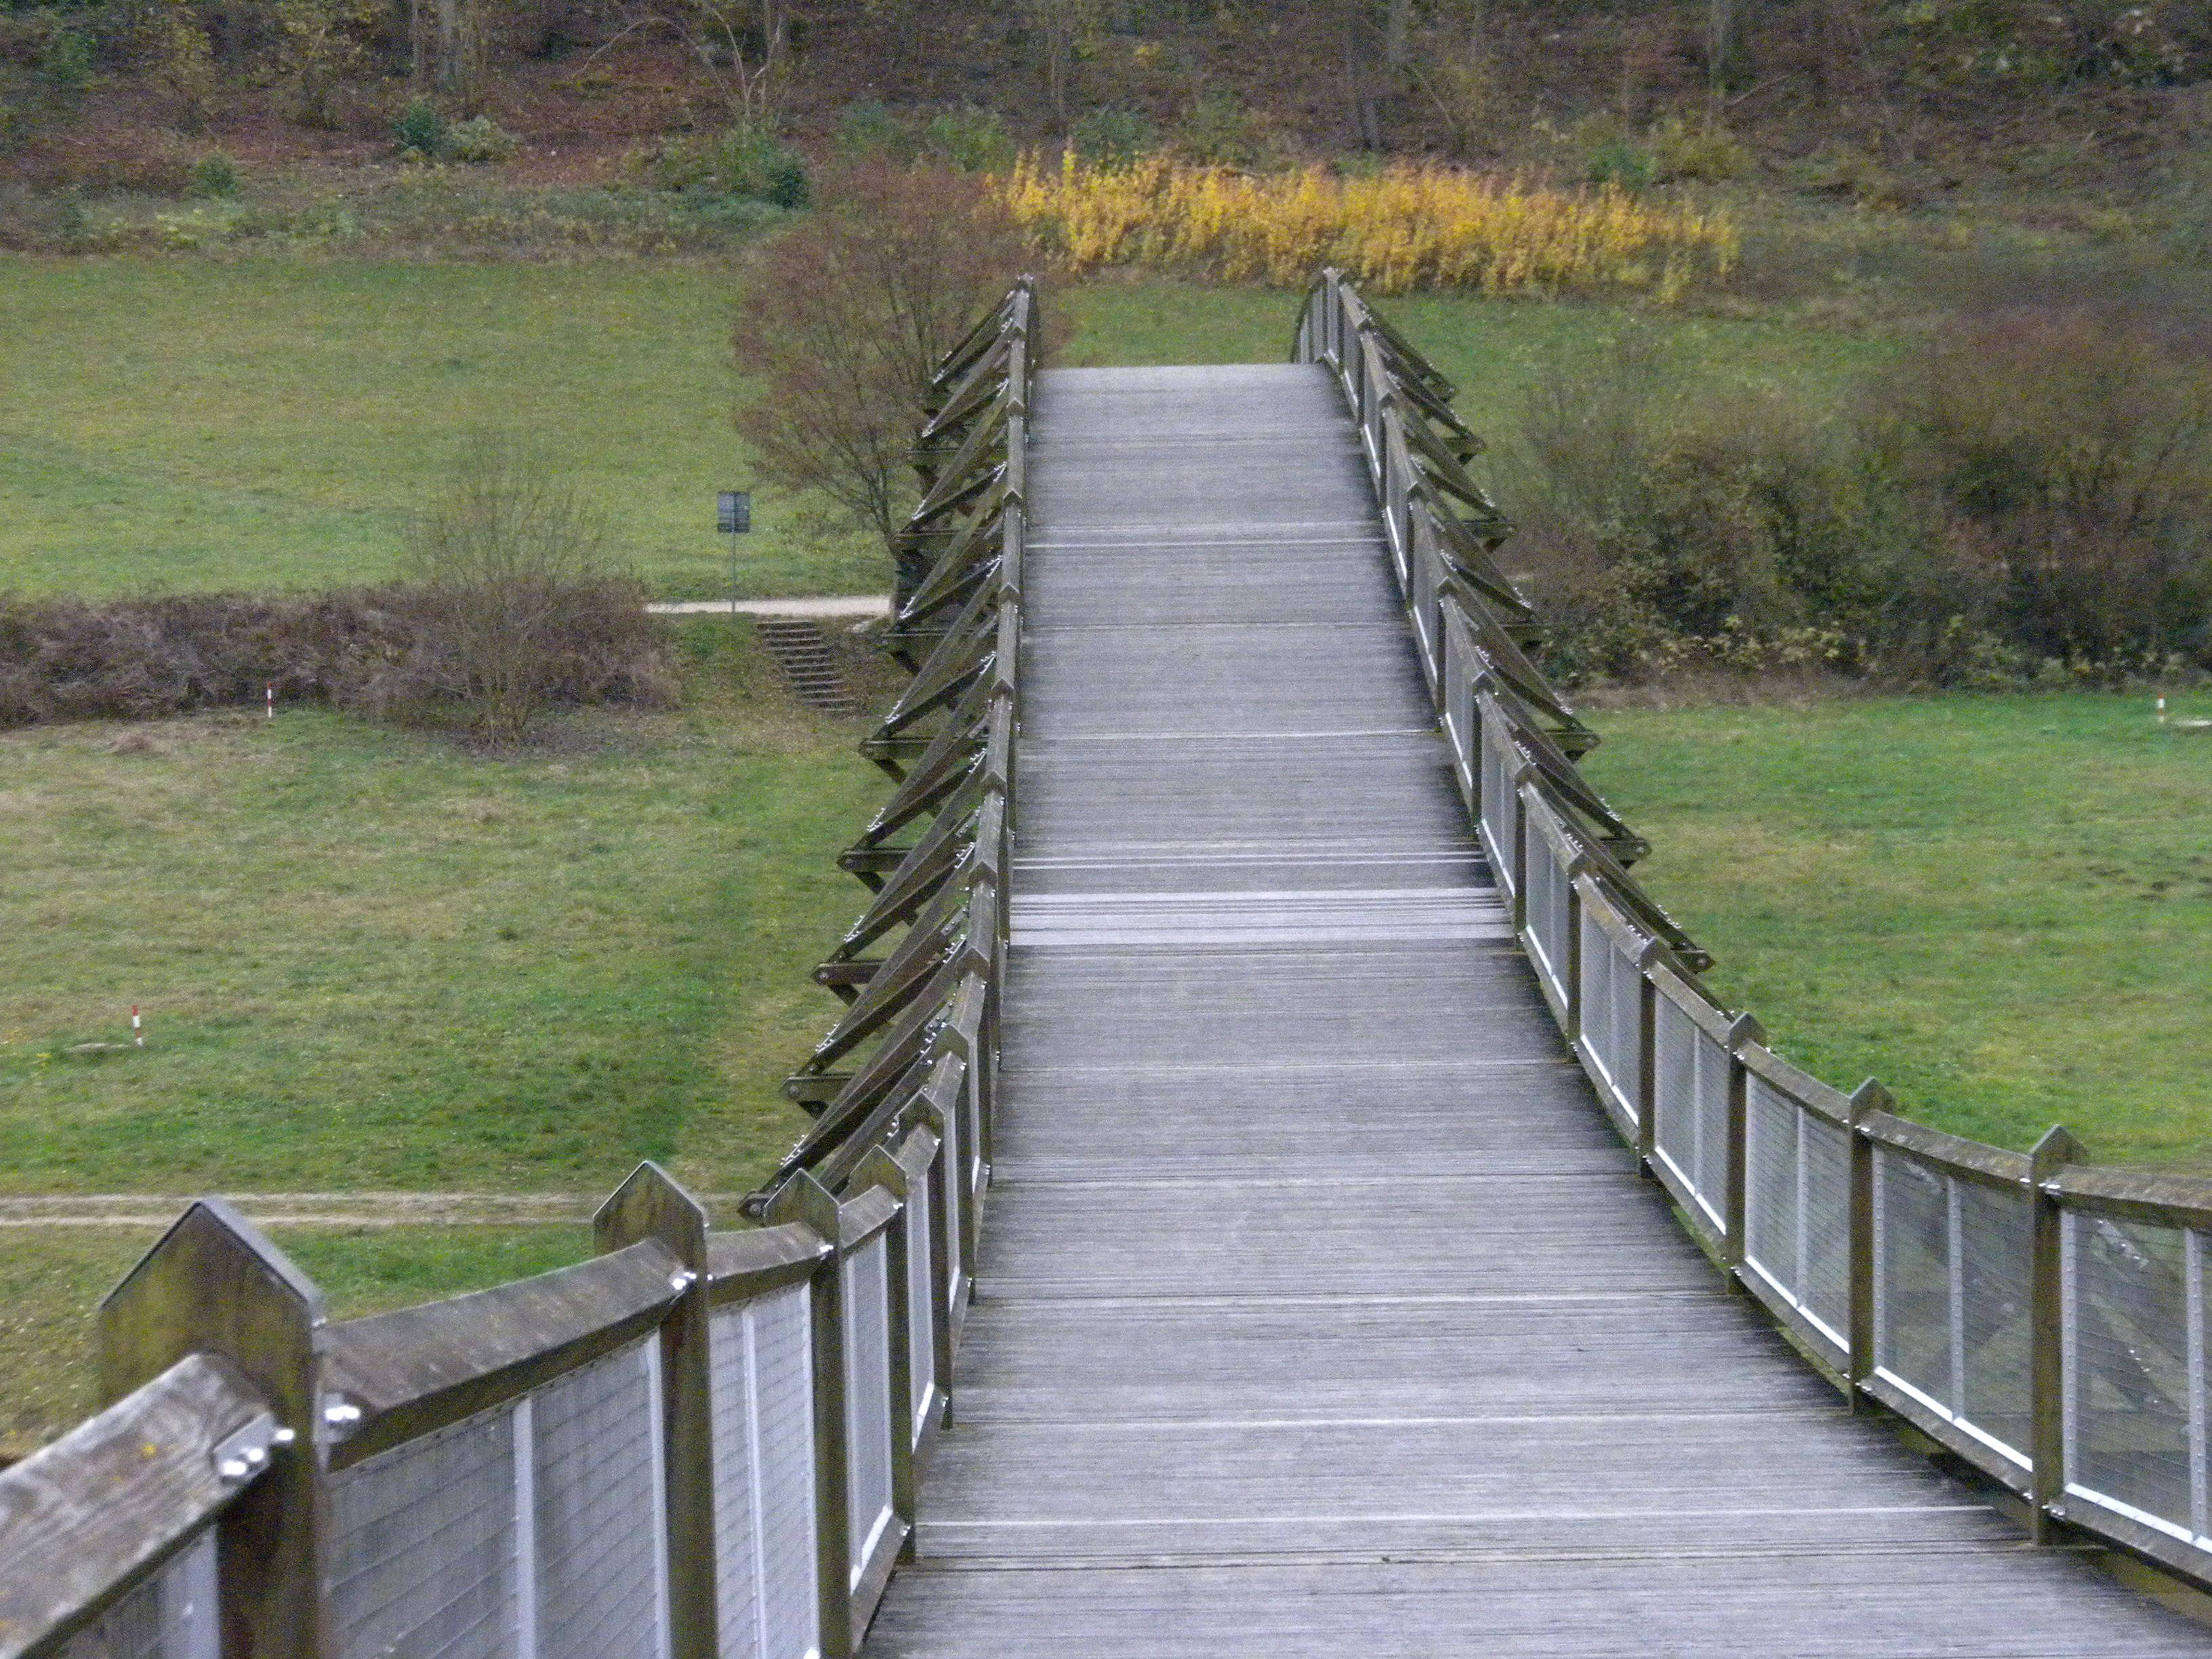 Essing Holzspannbrücke